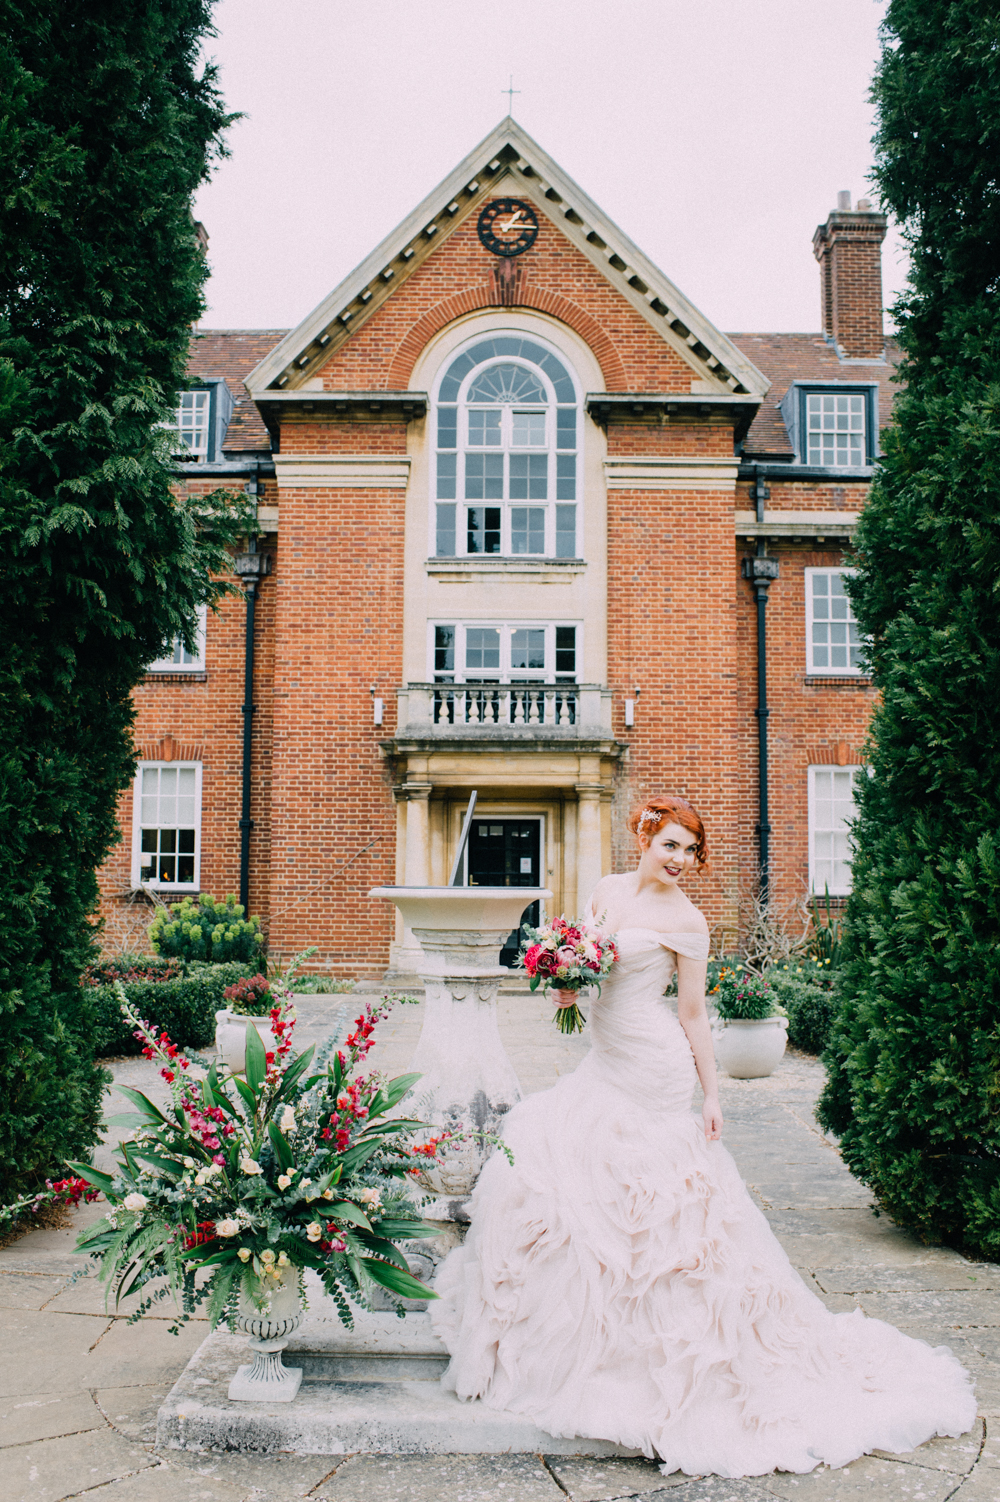 oxford_wedding_ladiesandlord-58